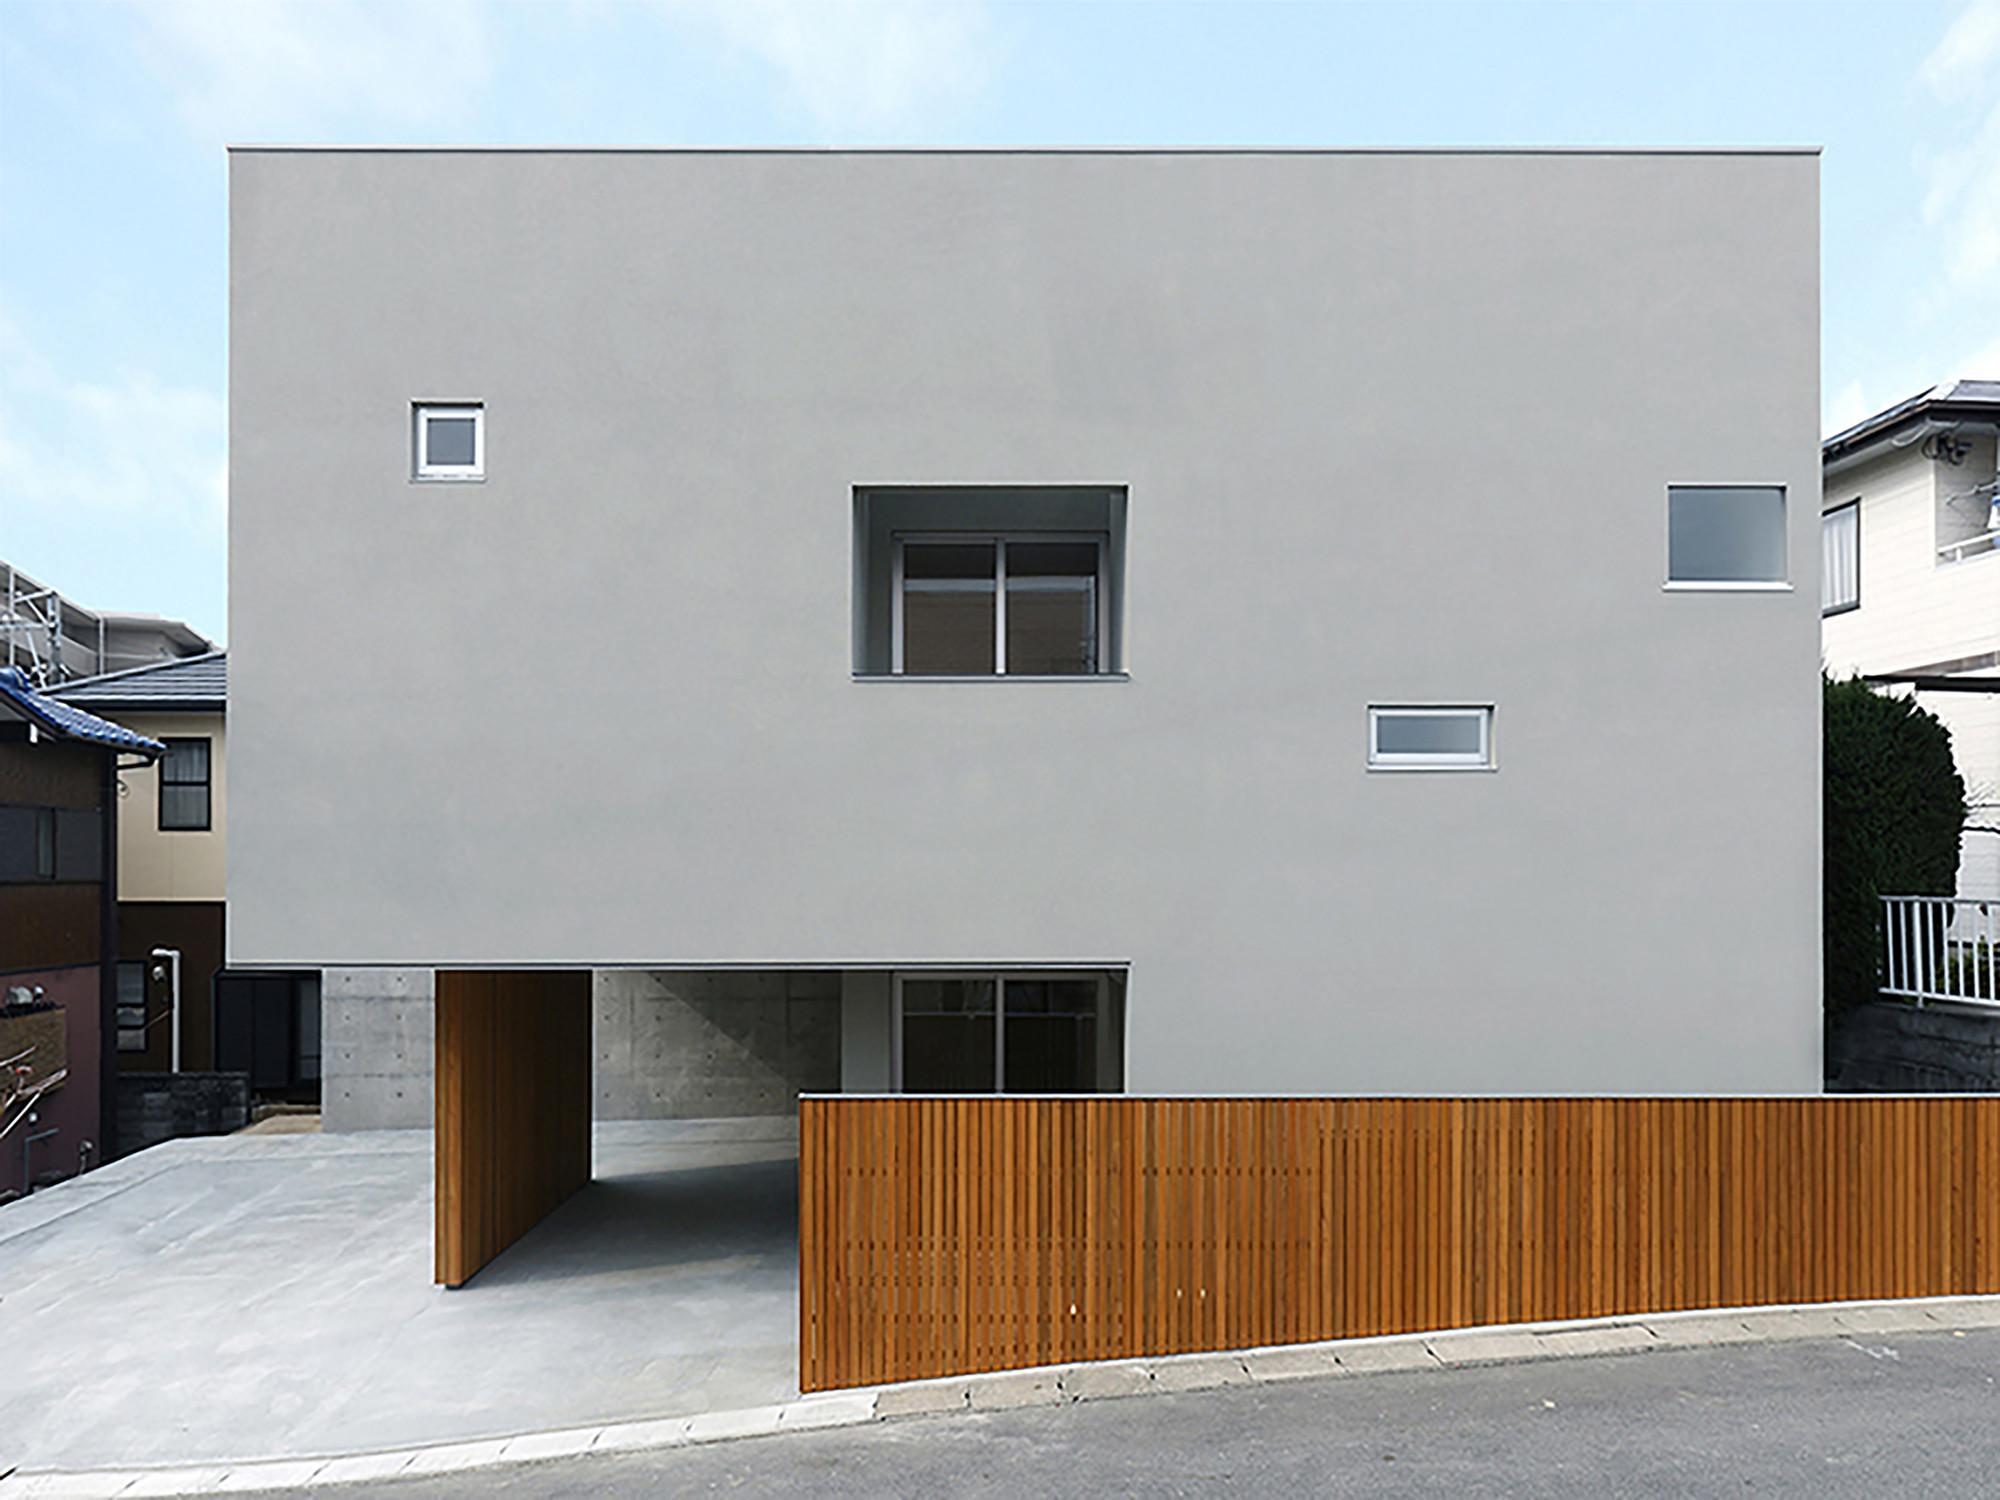 TER house / Kikumi Kusumoto | Ks ARCHITECTS, © Katsuzi Matsuo